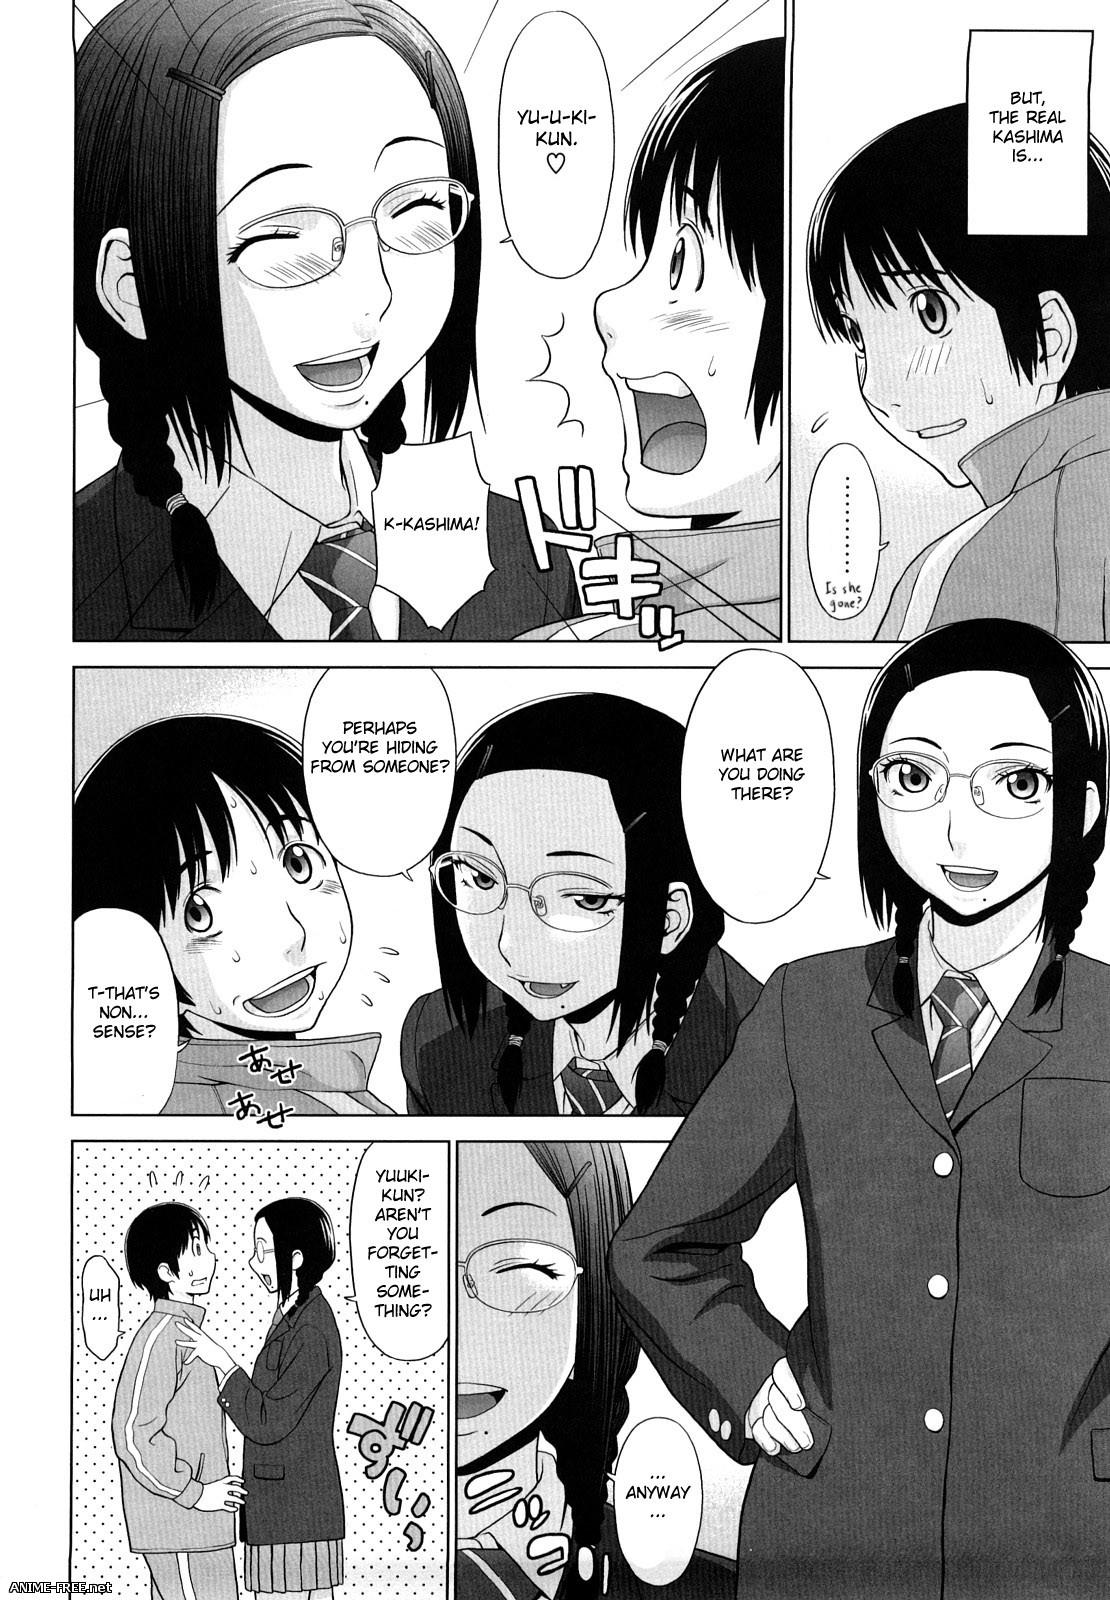 Yarii Shimeta (One Shot) - Сборник хентай манги [Ptcen] [RUS,ENG,JAP] Manga Hentai